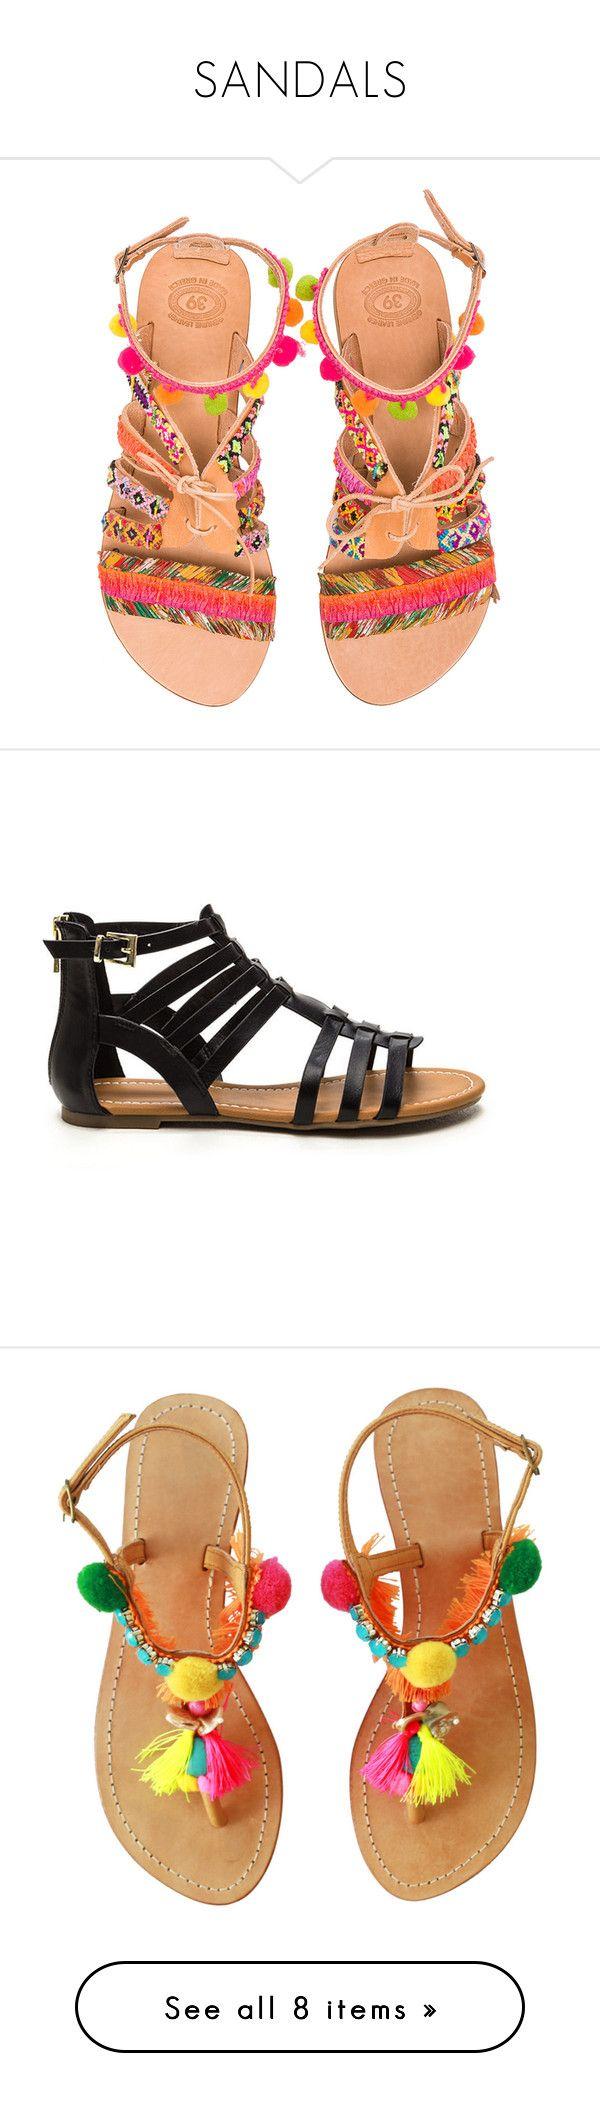 """SANDALS"" by alejandra-rodriguez-villalpando on Polyvore featuring shoes, sandals, flats, leather shoes, woven flats, leather flats, lace up flats, braided sandals, black y black gladiator sandals"